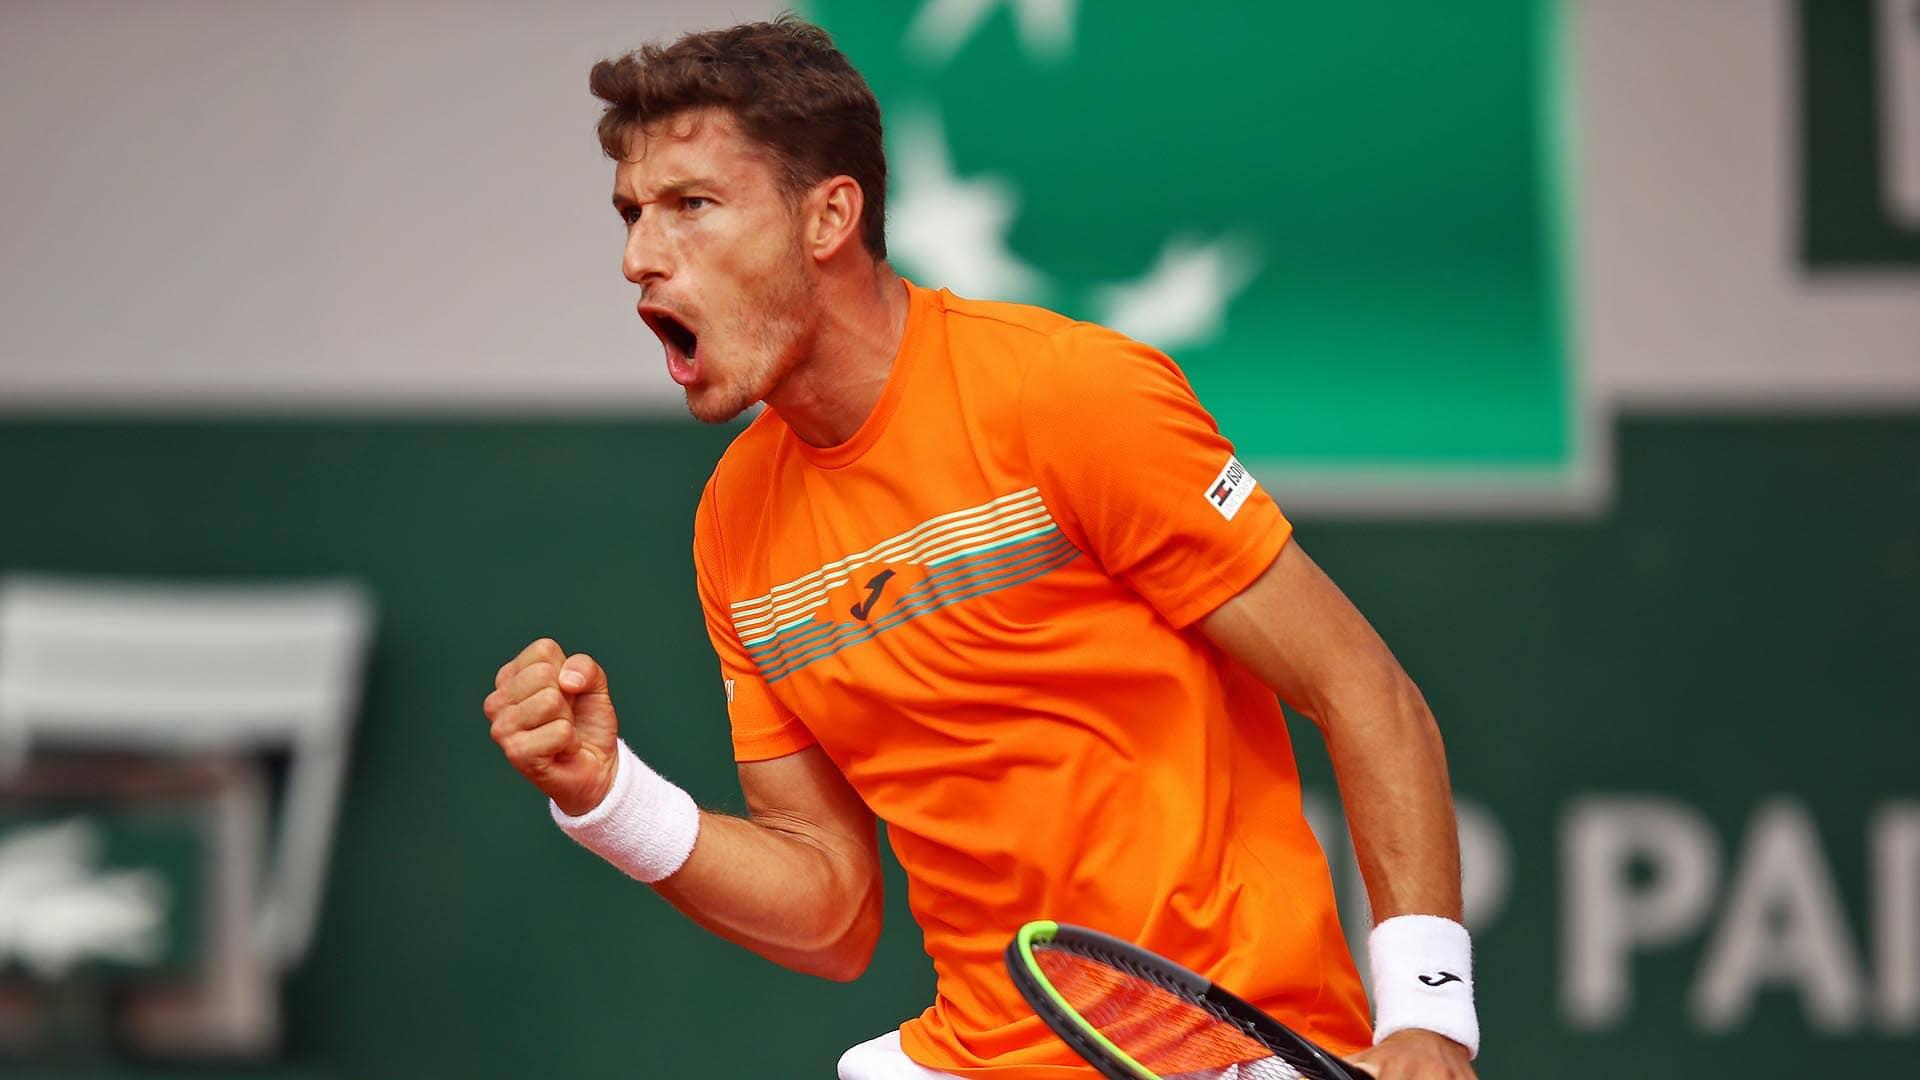 Hamburg Open 2021: Pablo Carreno Busta vs. Carlos Taberner Tennis Pick and Prediction